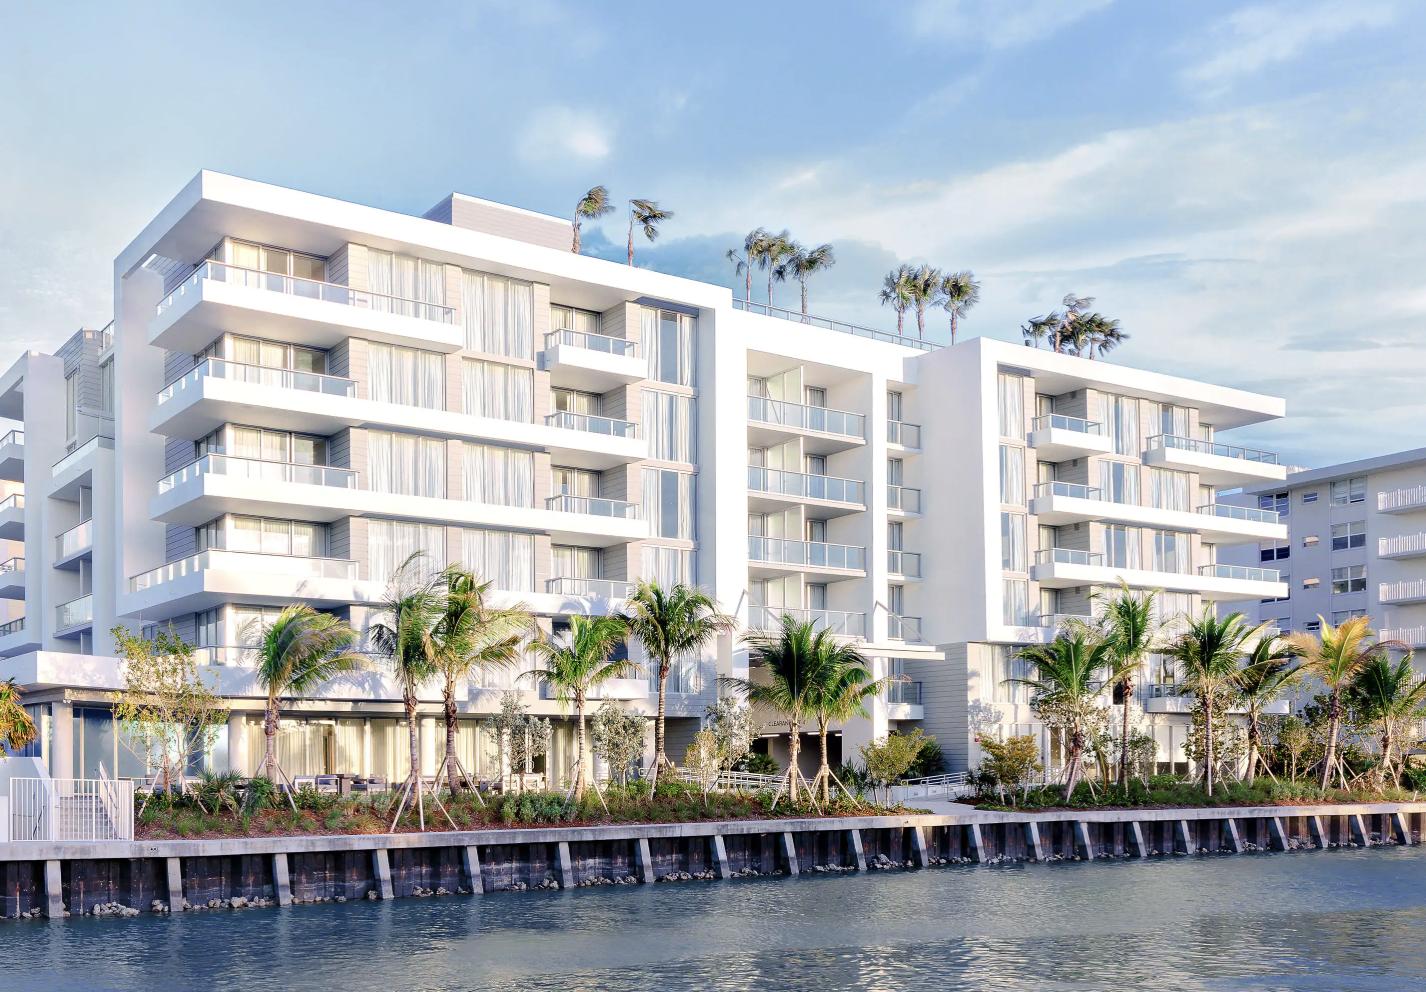 2f174c5b0e2d7be231968c80075505e1 - Places To Stay In Miami Gardens